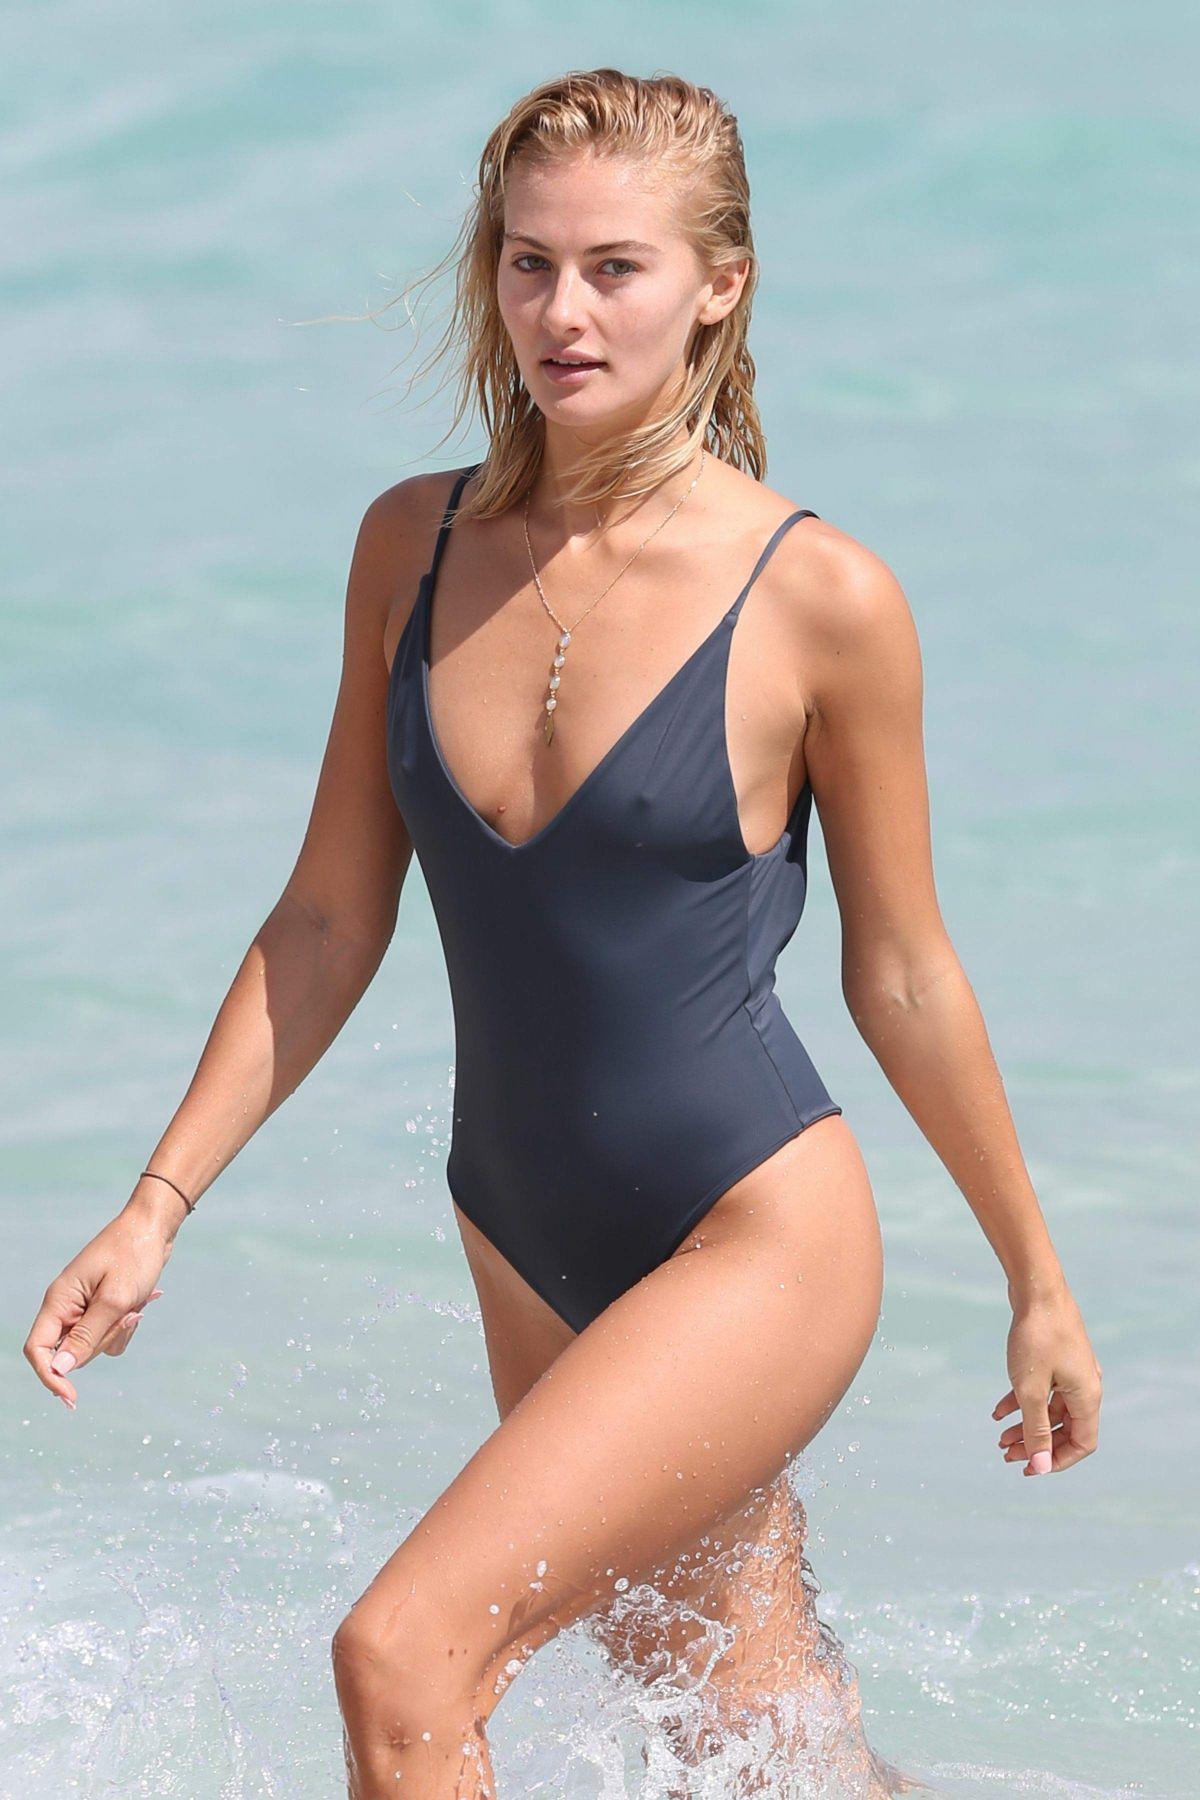 Bikini Selena Weber nudes (41 foto and video), Tits, Fappening, Boobs, swimsuit 2020